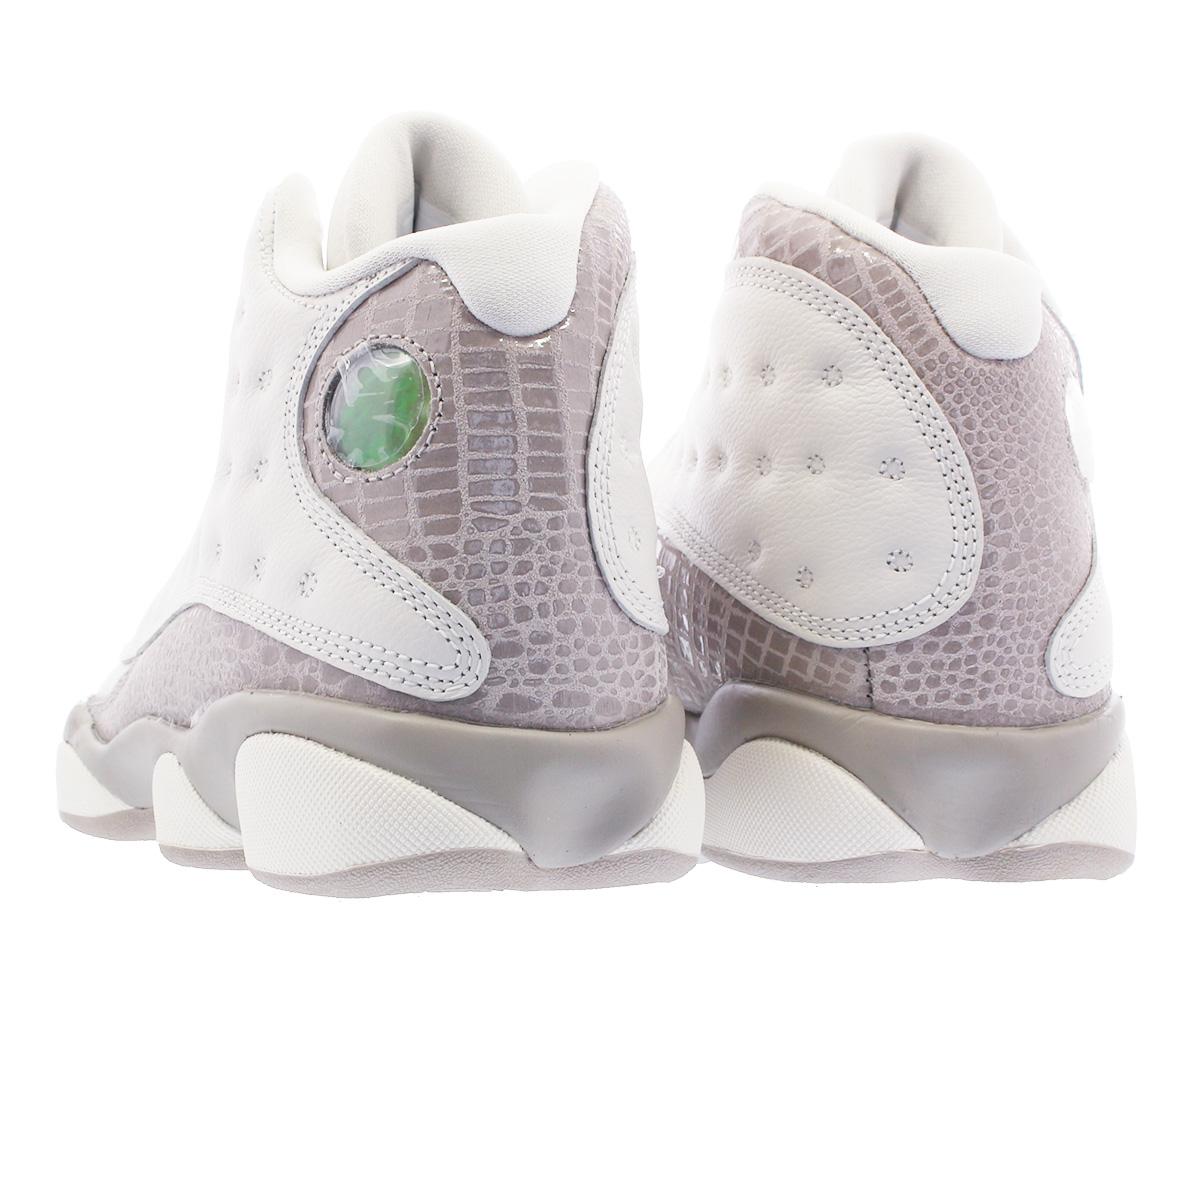 separation shoes a2521 f5e15 NIKE WMNS AIR JORDAN 13 RETRO Nike women Air Jordan 13 nostalgic  PHANTOM/MOON PARTICLE aq1757-004